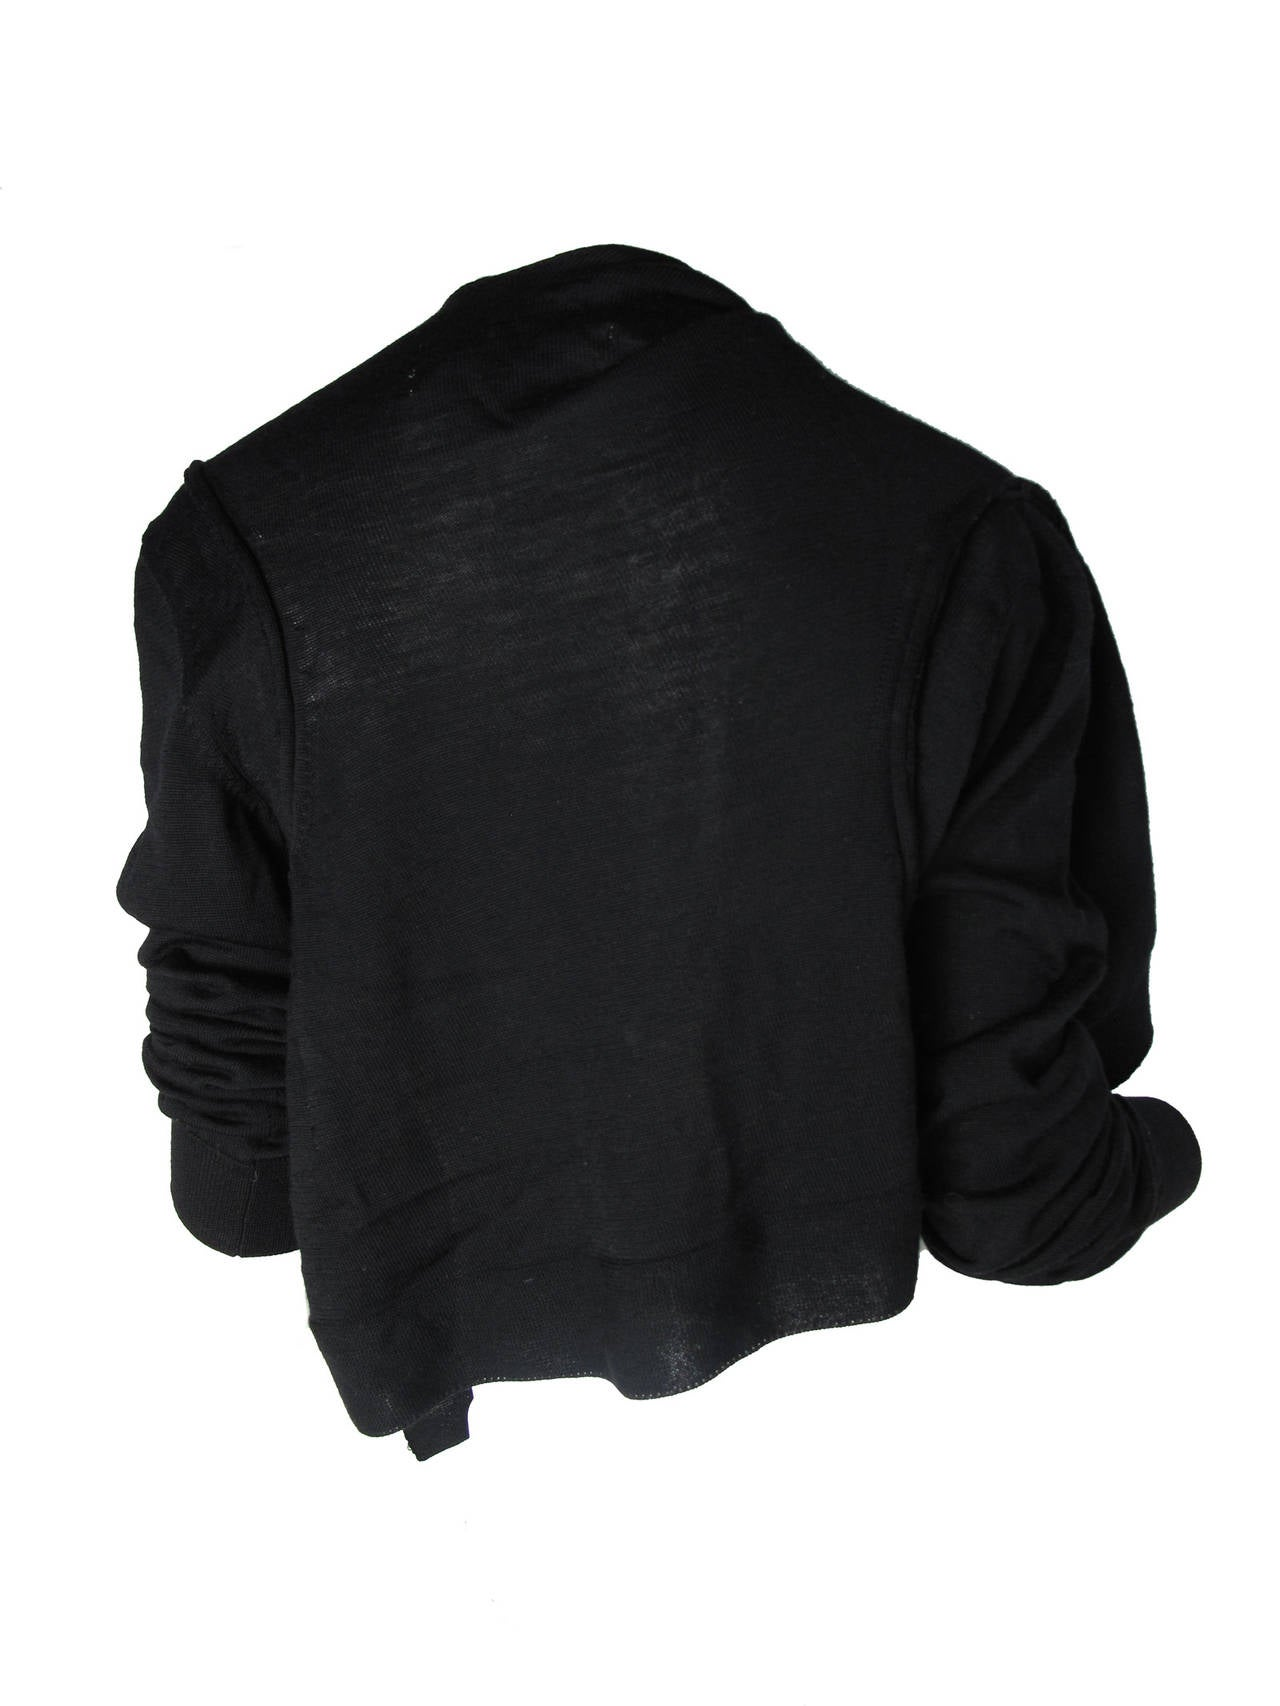 Comme des Garcons Black Wool Cardigan 2